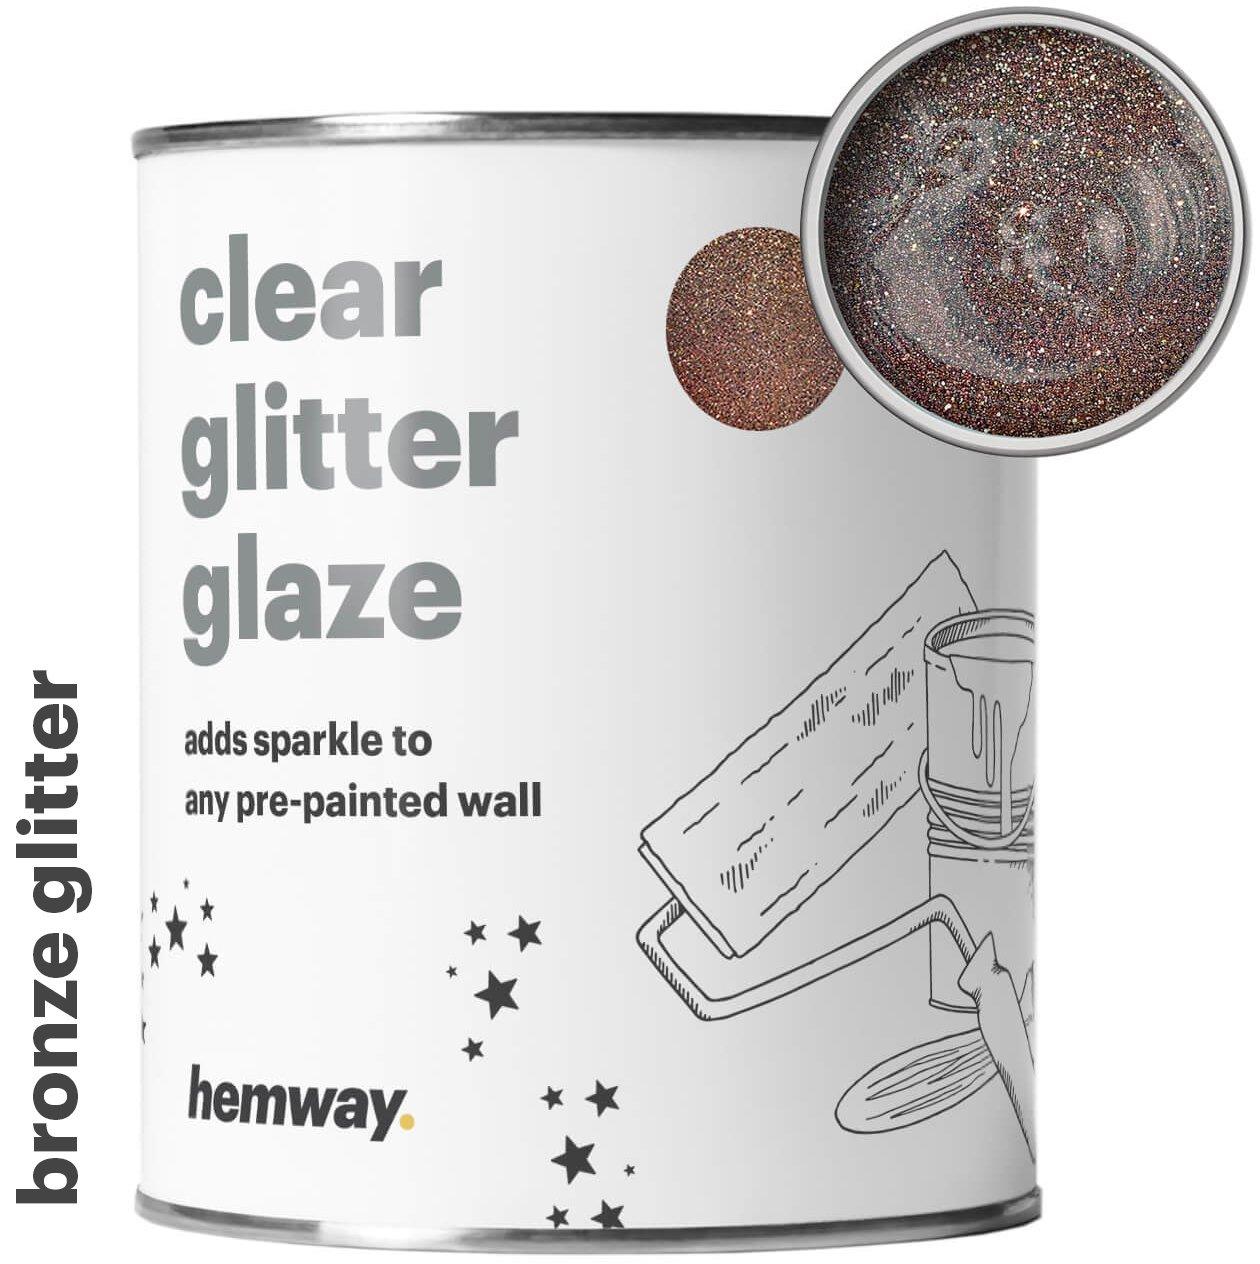 Hemway Clear Glitter Paint Glaze (Bronze) 1L/Quart for Pre-Painted Walls Acrylic, Latex, Emulsion, Ceiling, Wood, Varnish, Dead flat, Matte, Soft Sheen, Silk (CHOICE OF 25 GLITTER COLOURS)